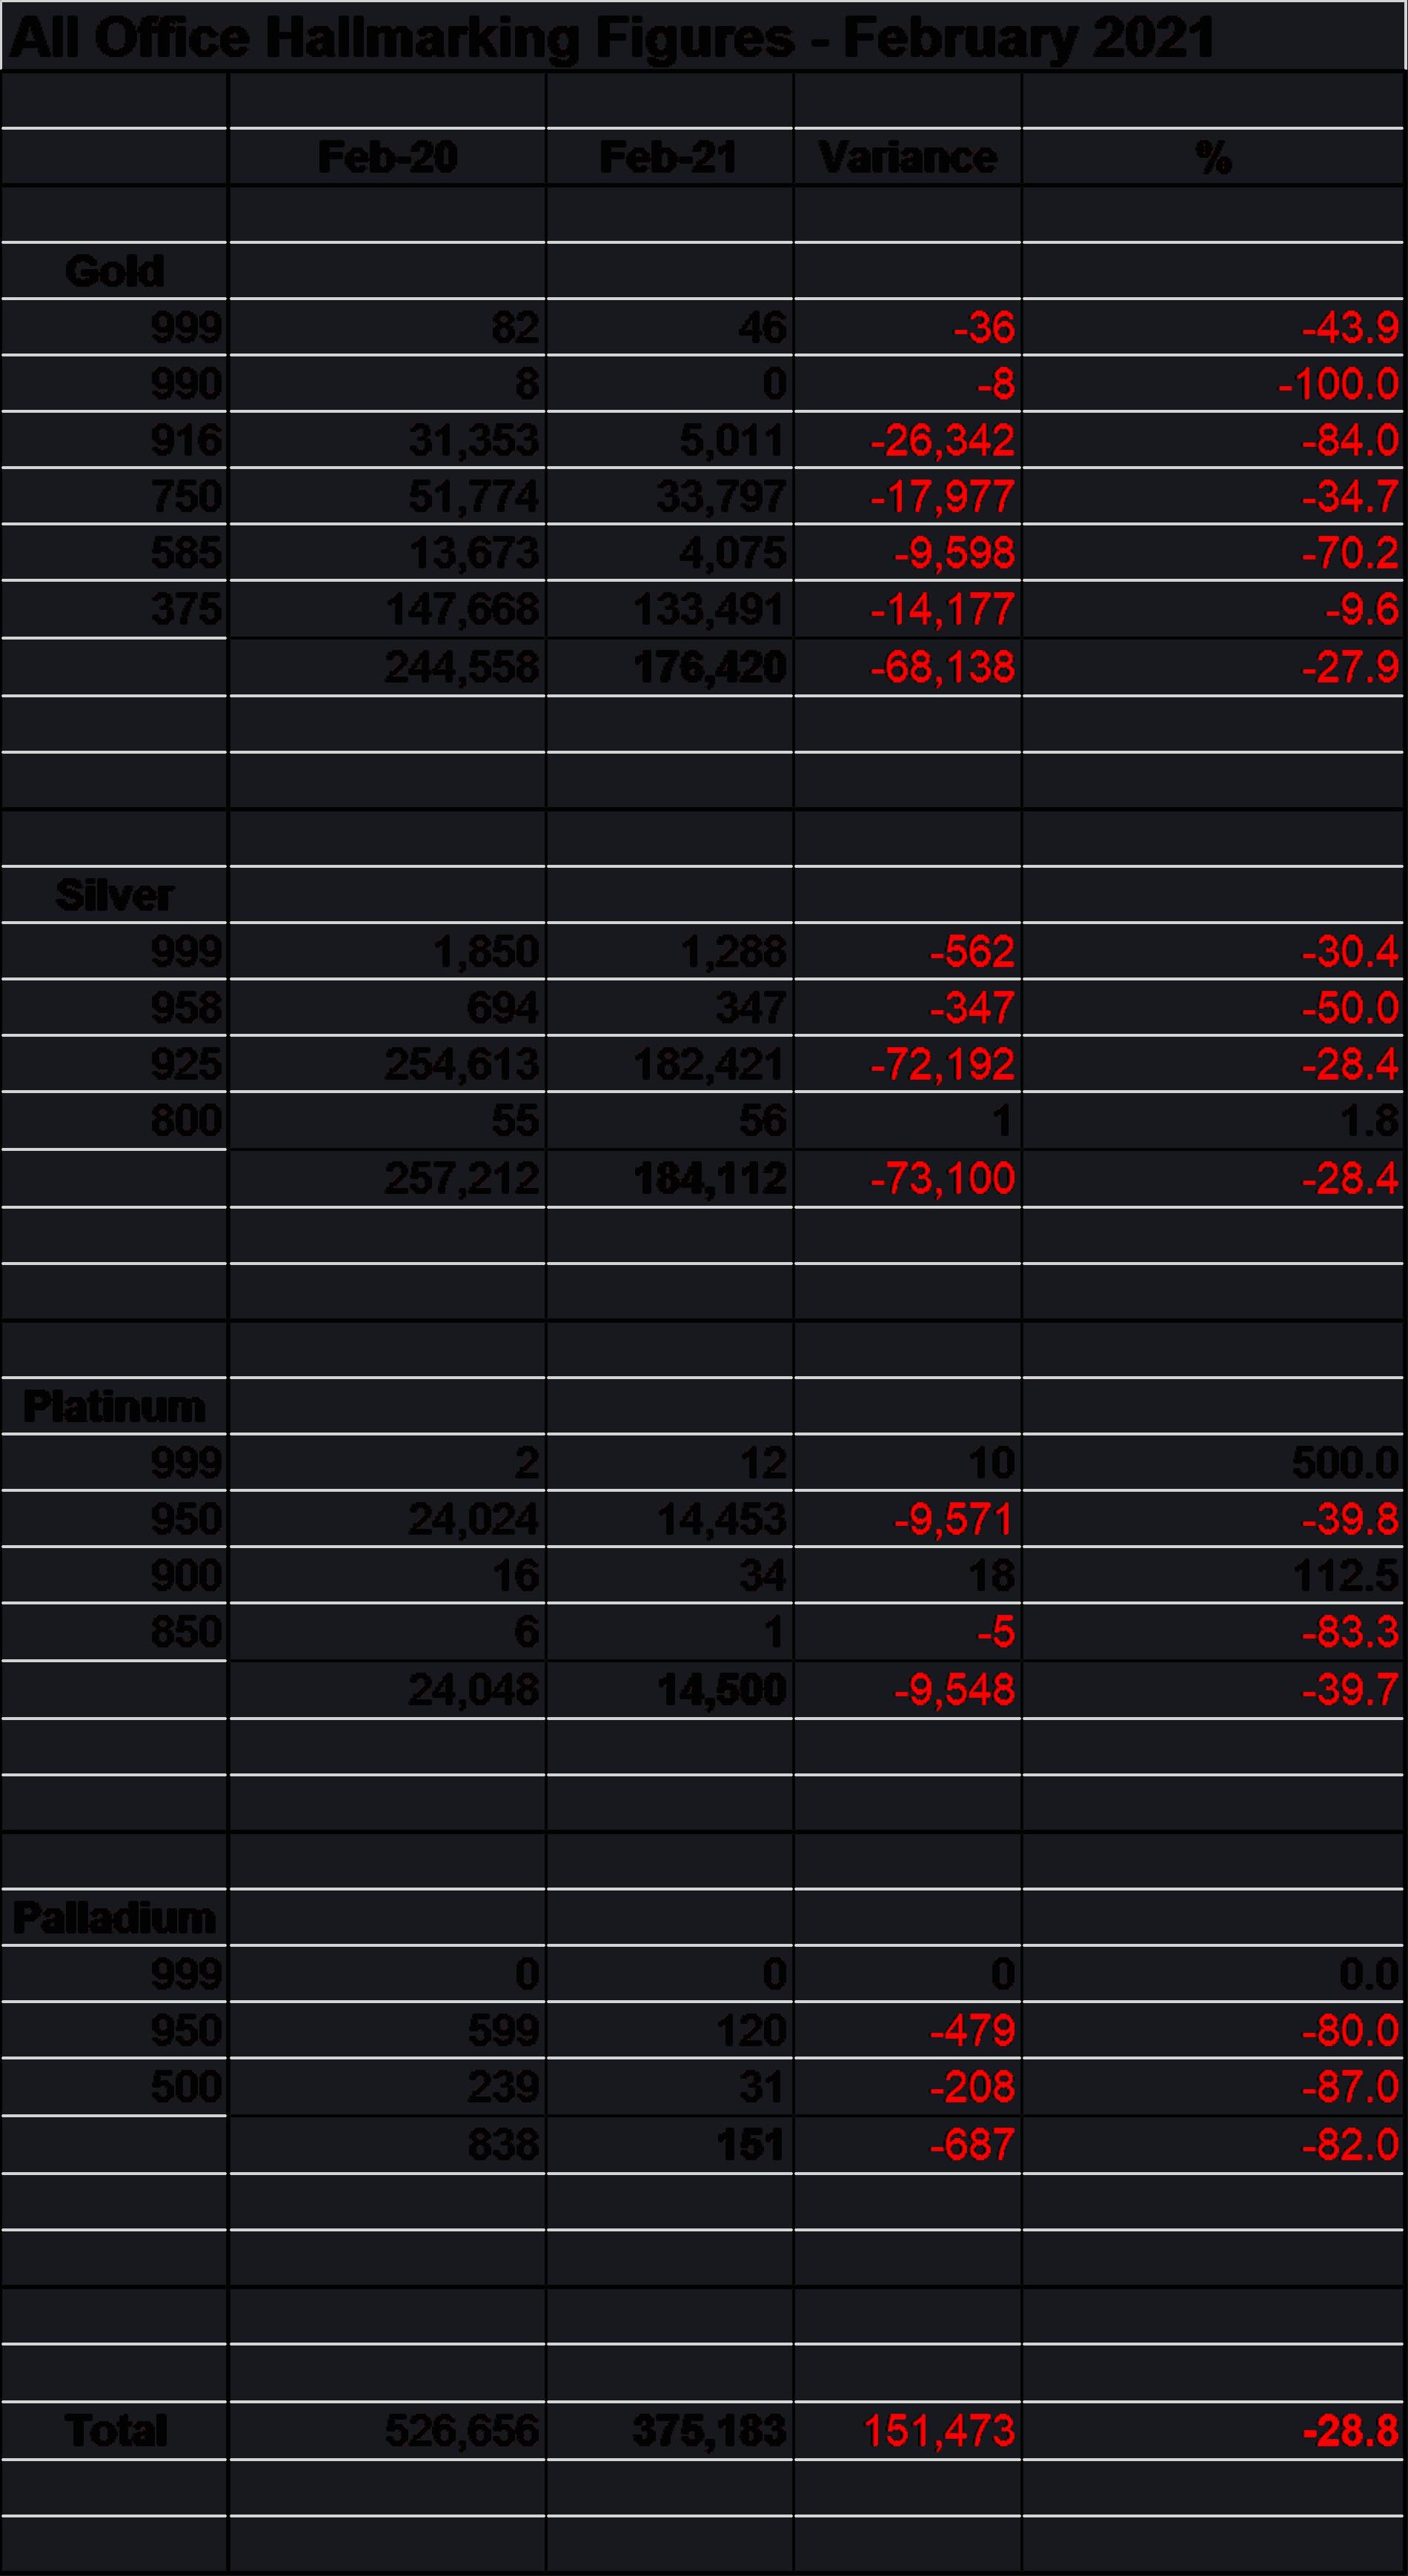 Sharp year-on-year hallmarking Figures- February 2021